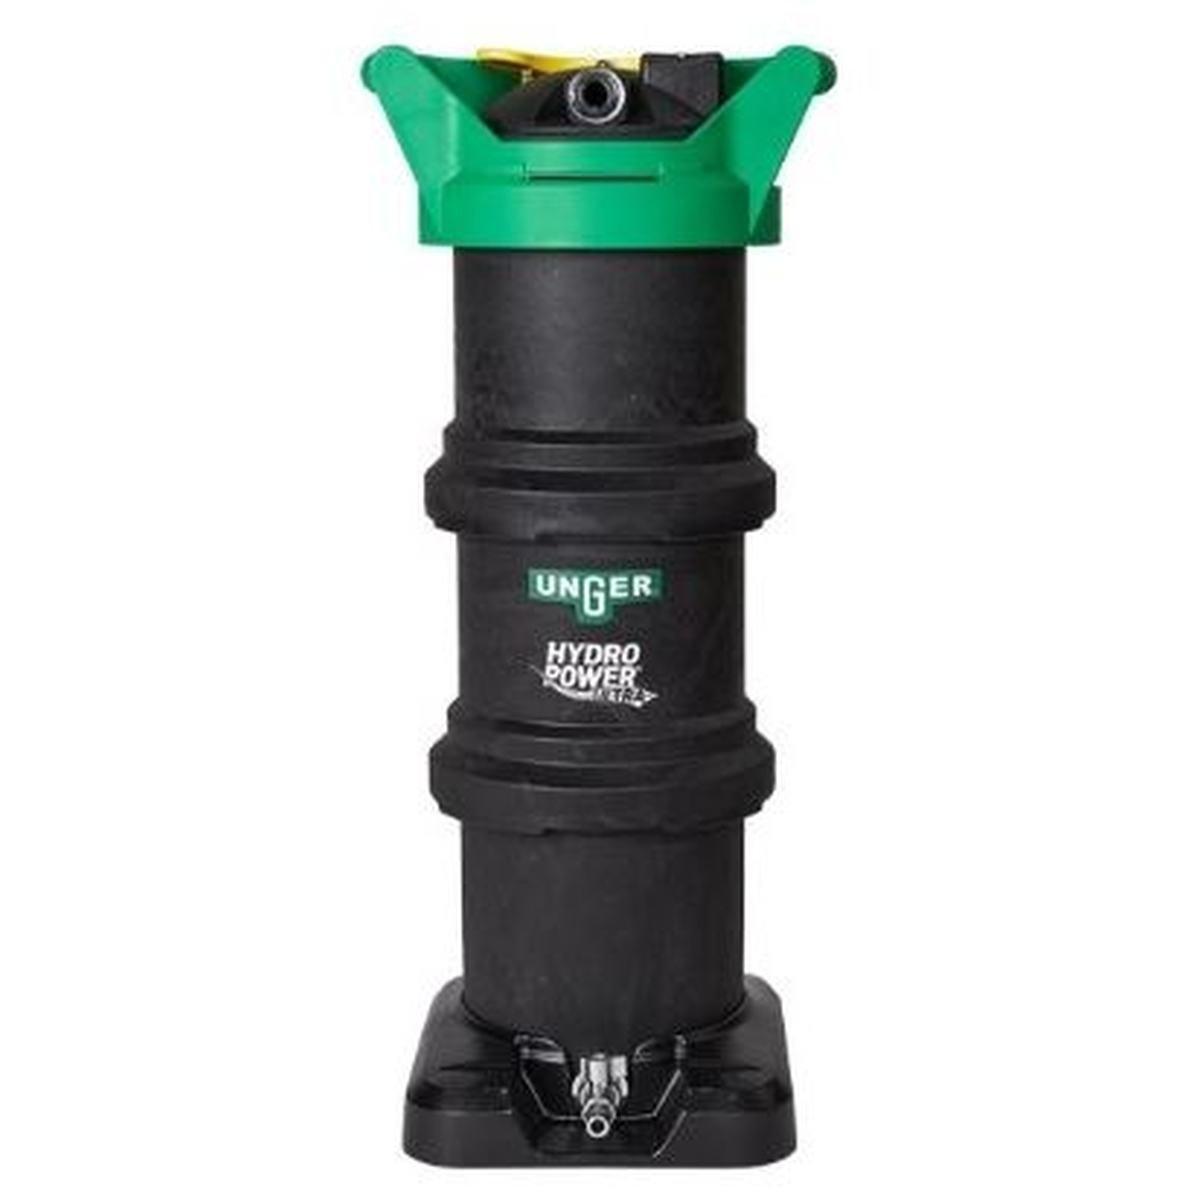 HydroPower rentvattensystem stor modell - Unger